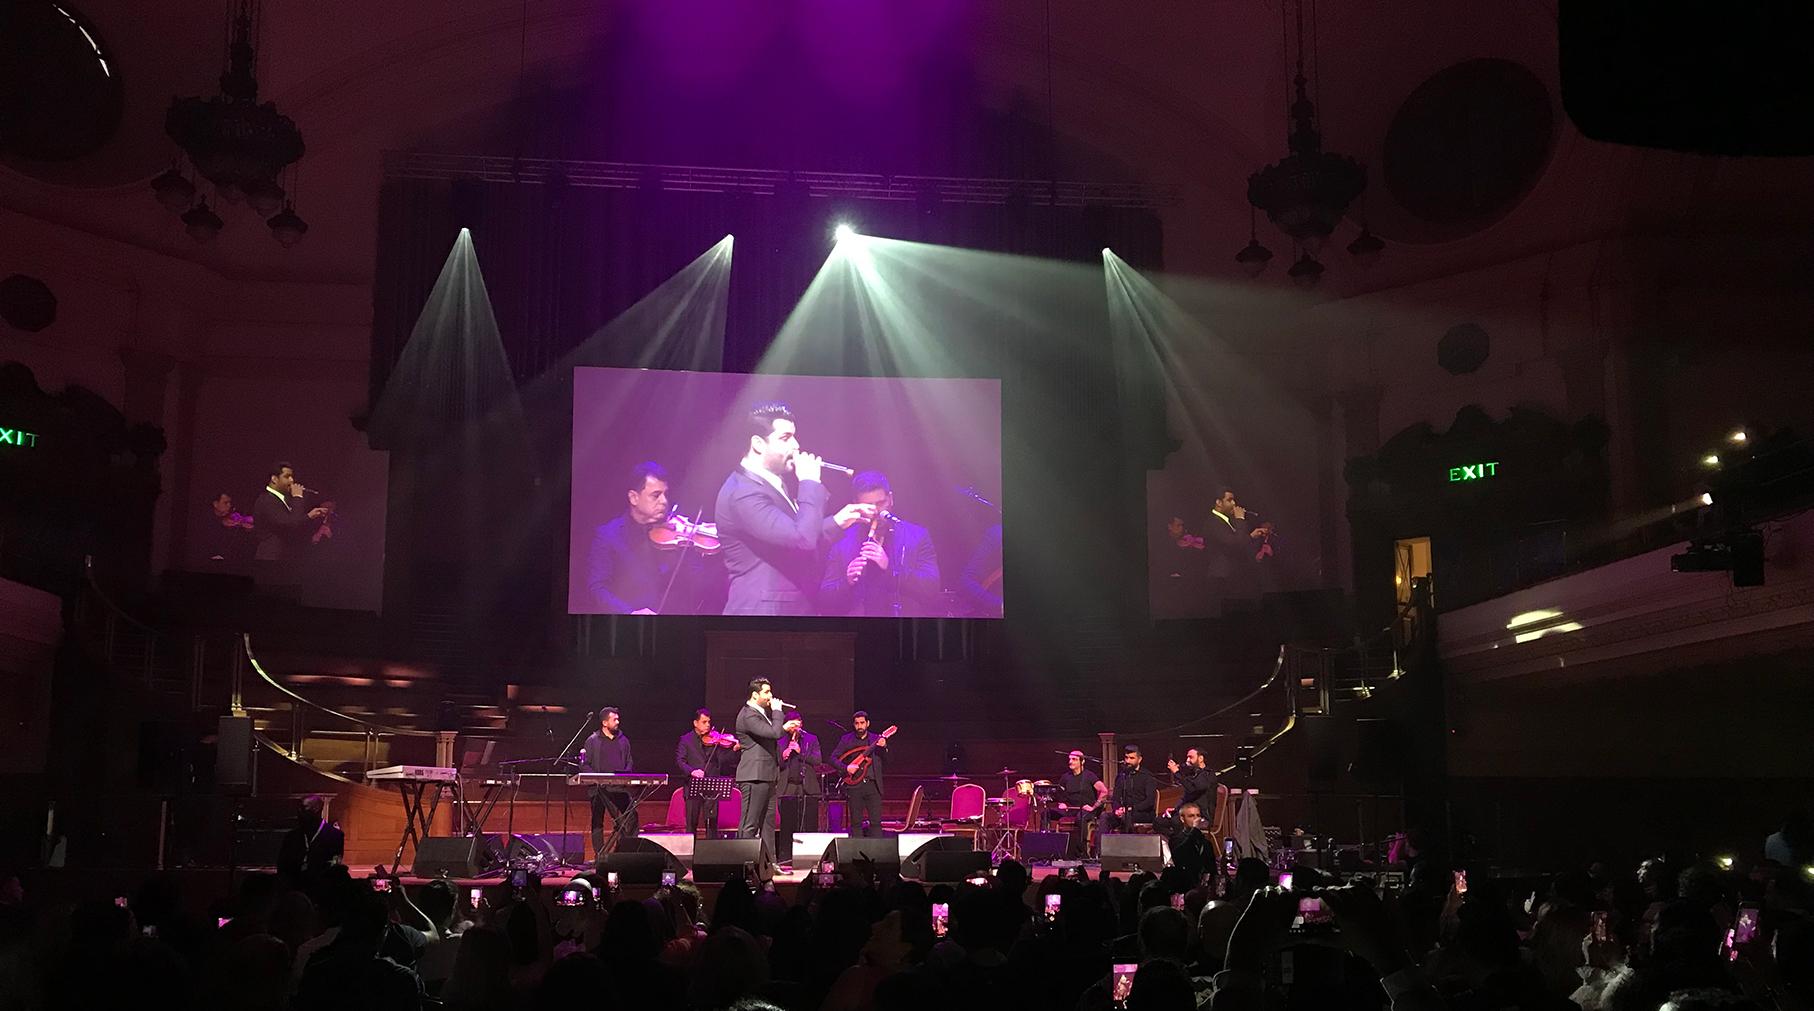 Live Concert Streaming